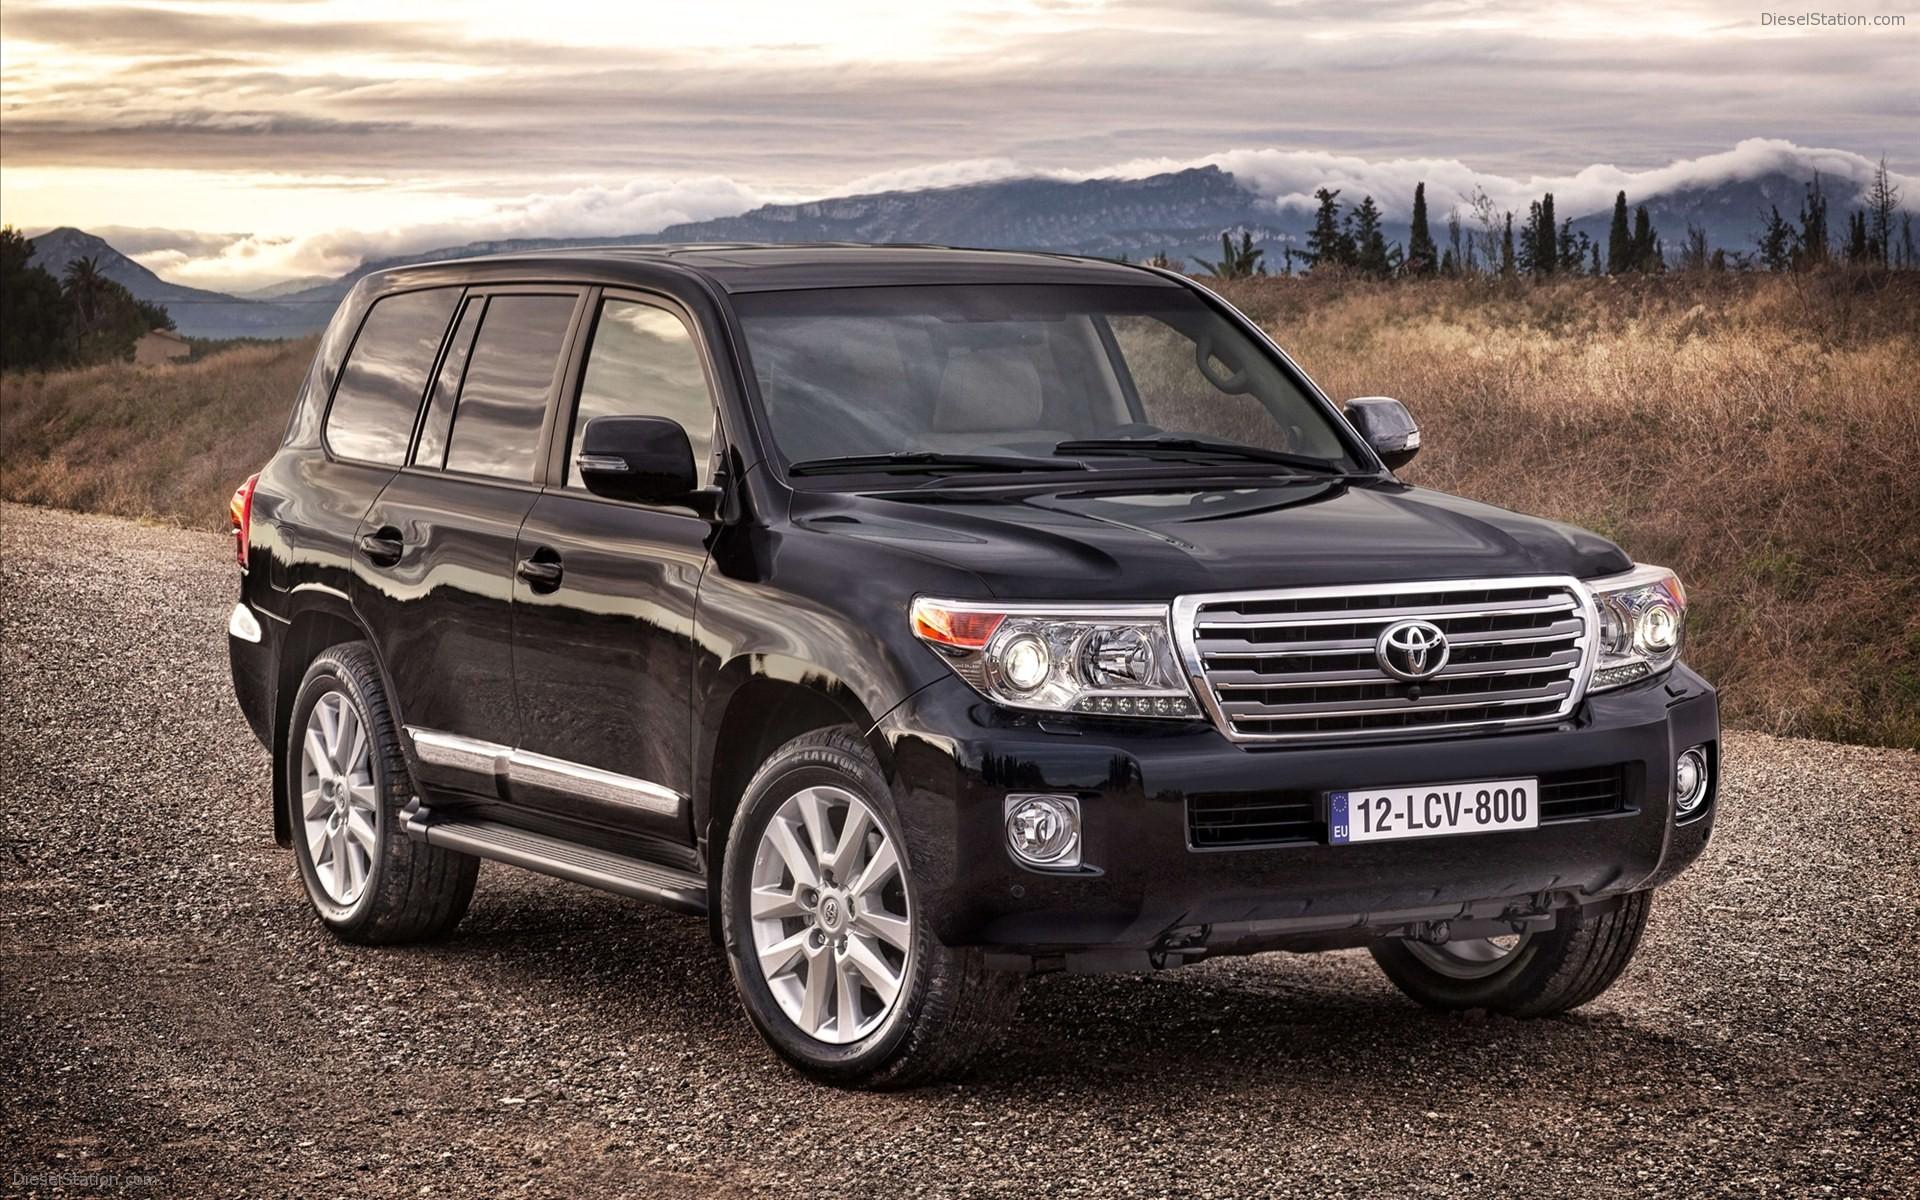 Toyota-Land-Cruiser-V8-2012-widescreen-02